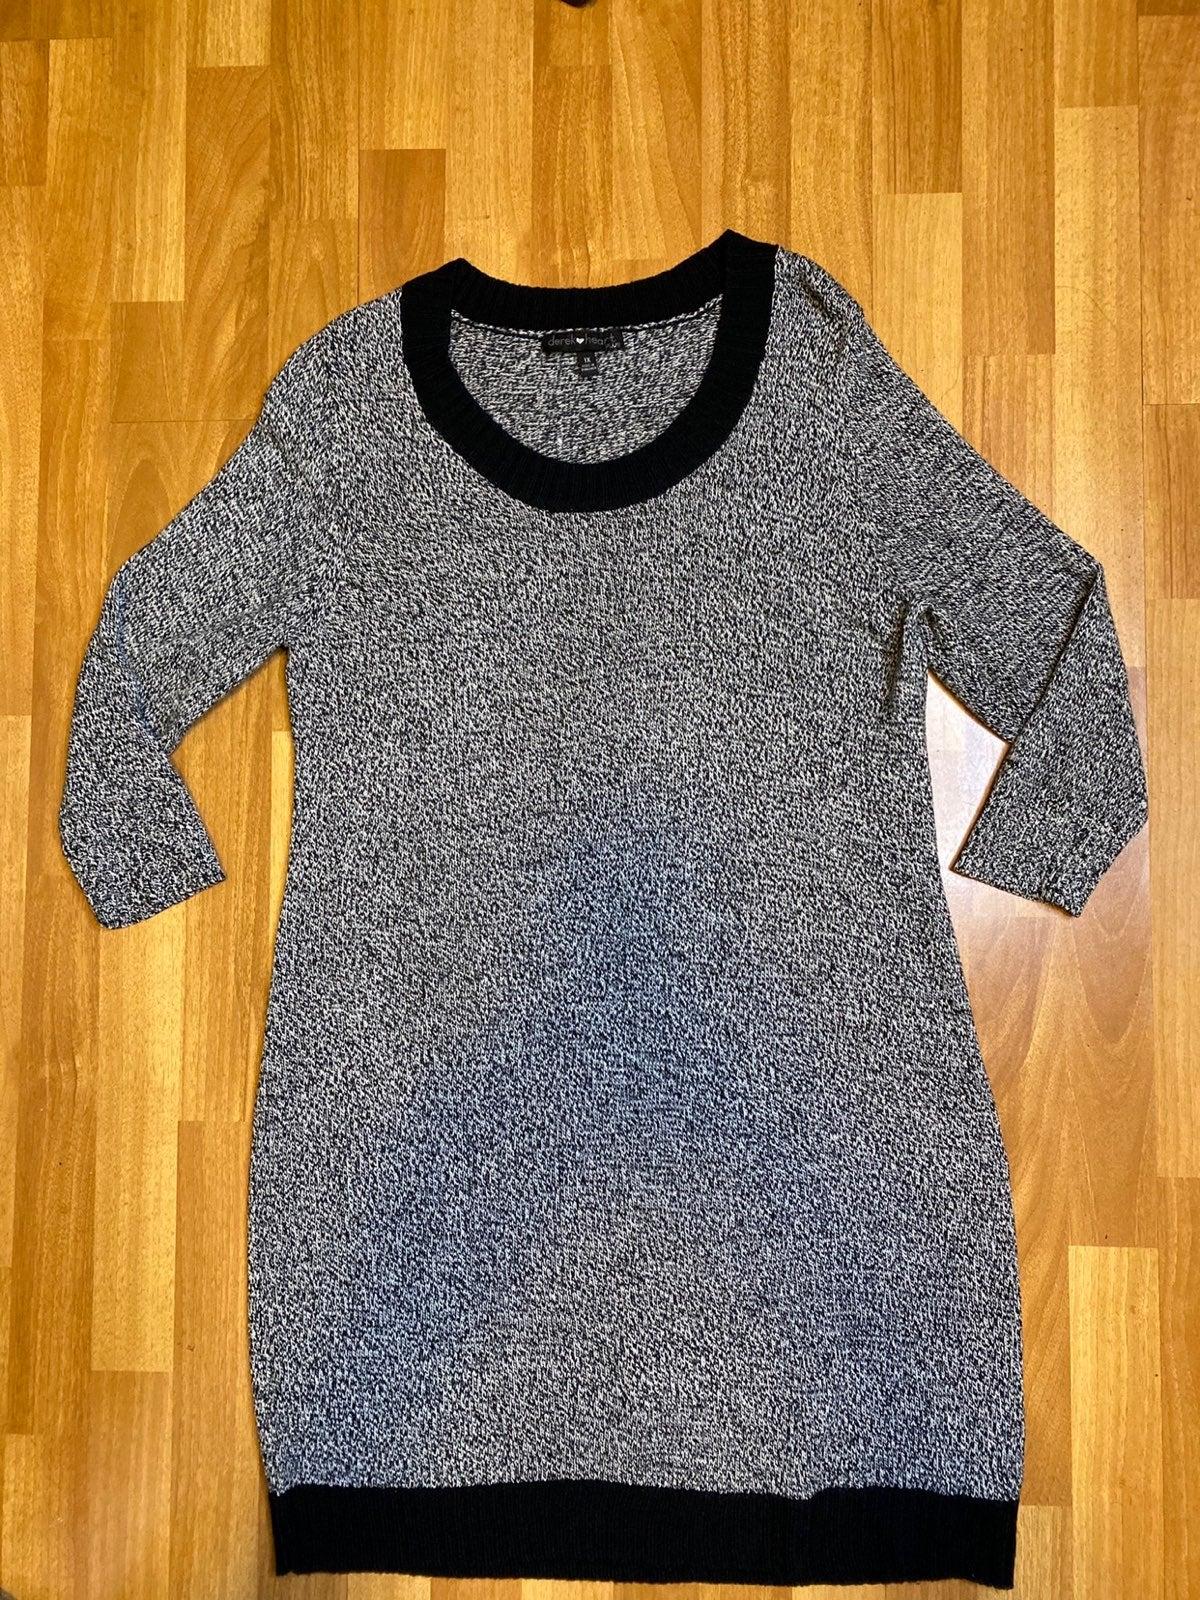 Derek Heart Sweater Dress Size 1X